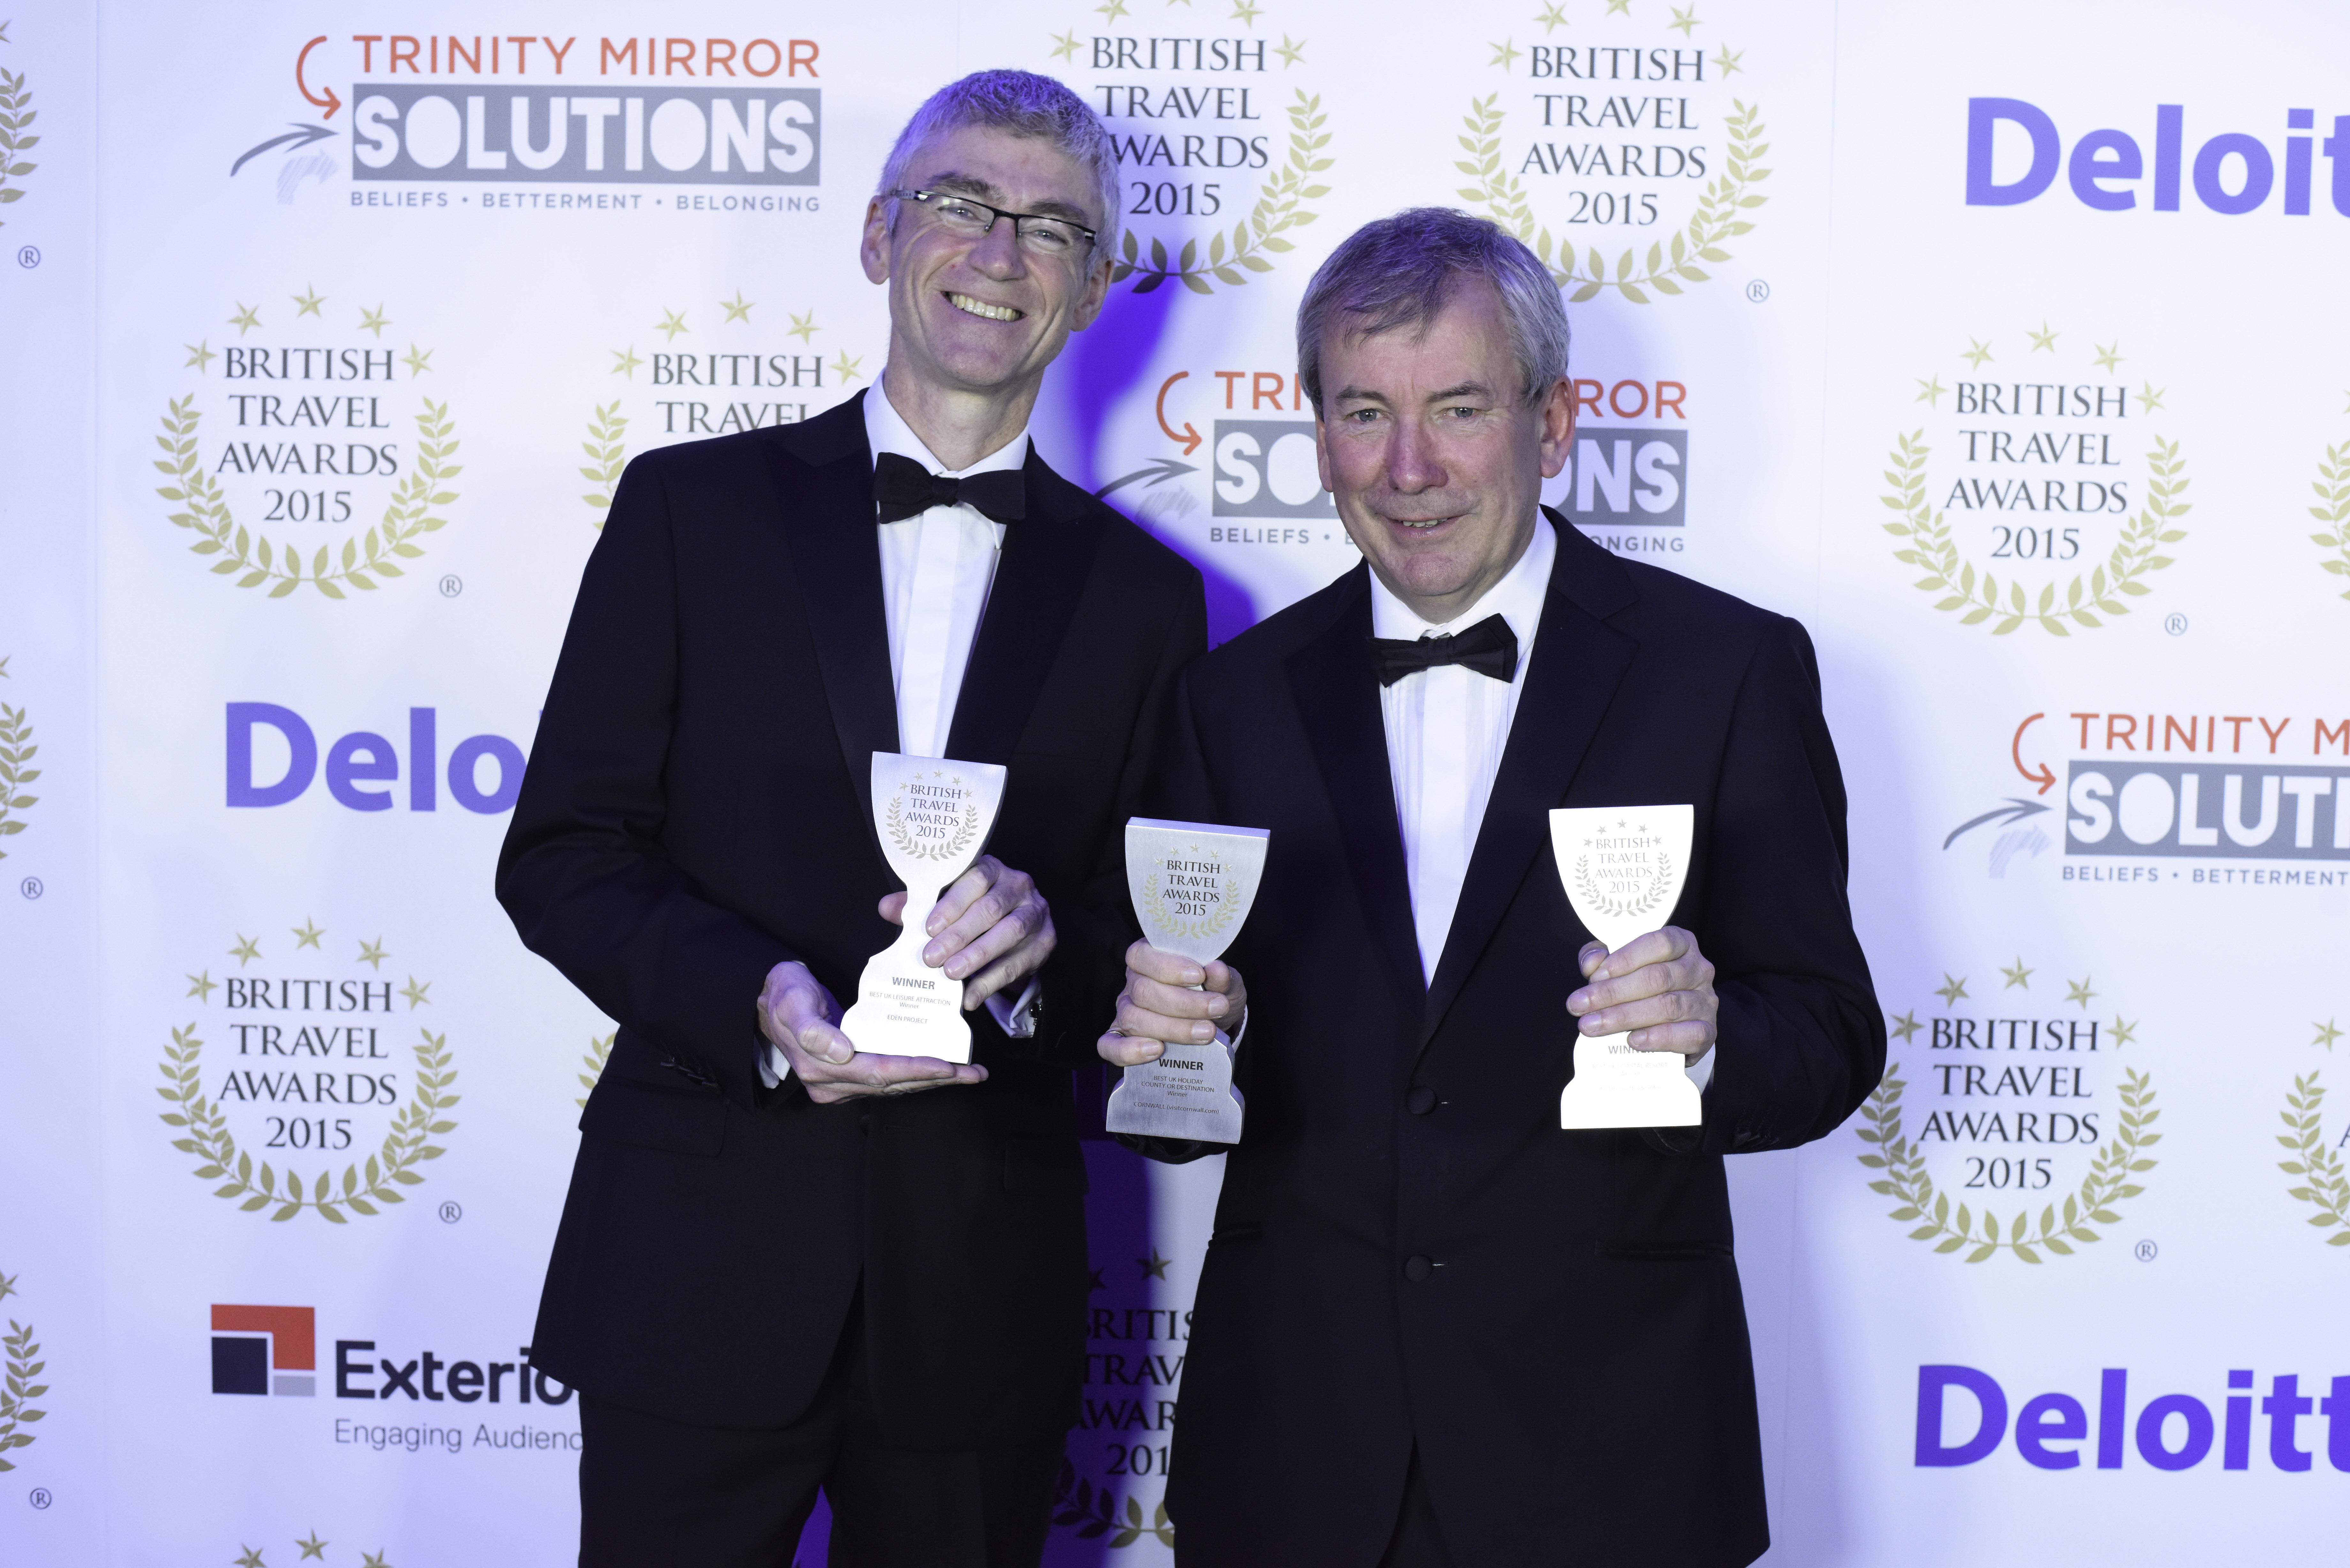 British Travel Awards 2015